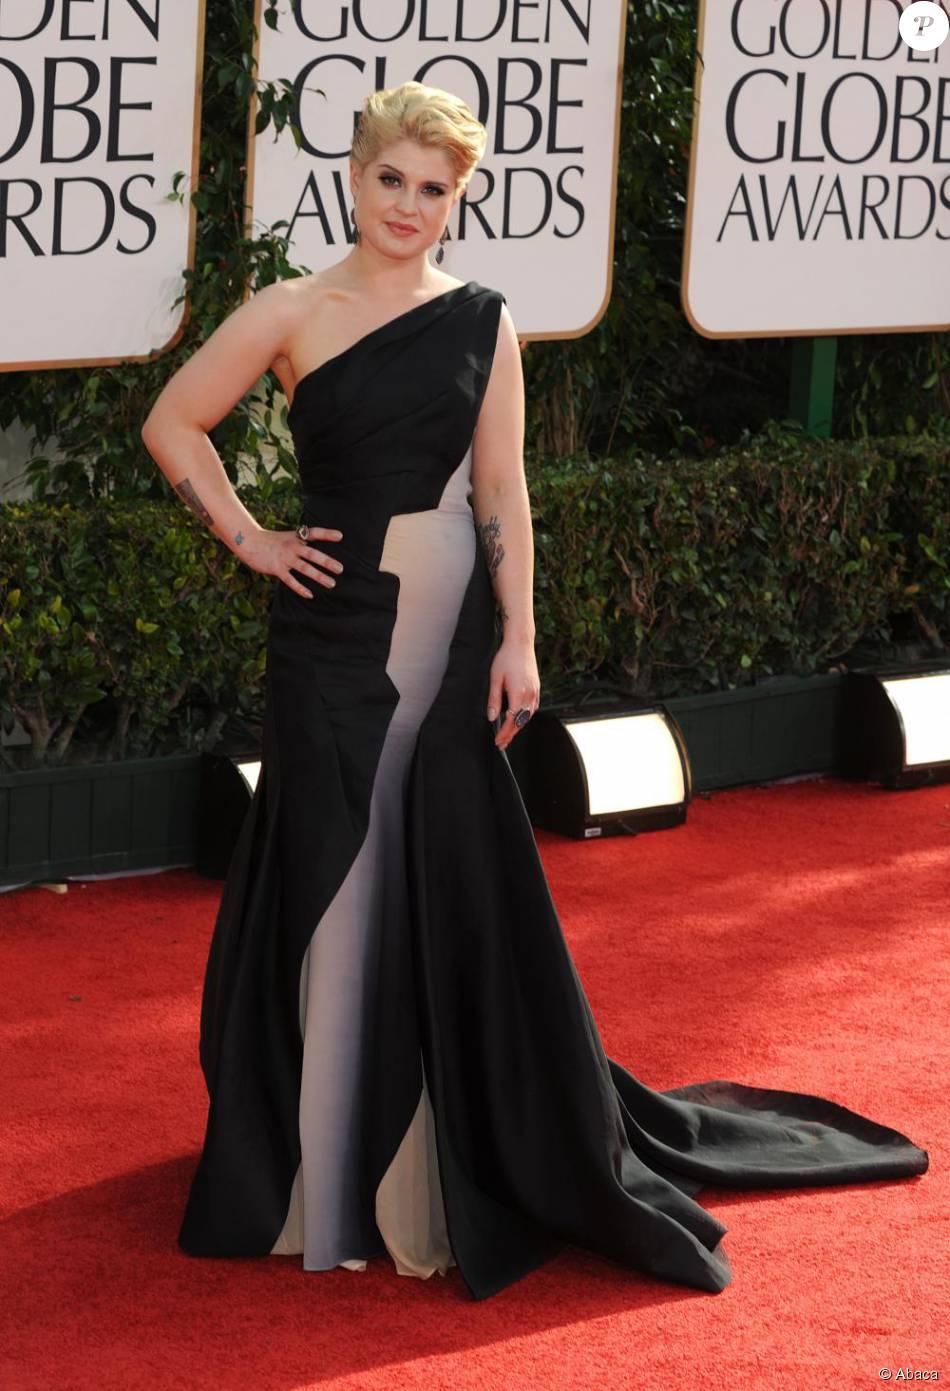 Kelly Osbourne dans sa robe Zac Posen lors des Golden Globes.